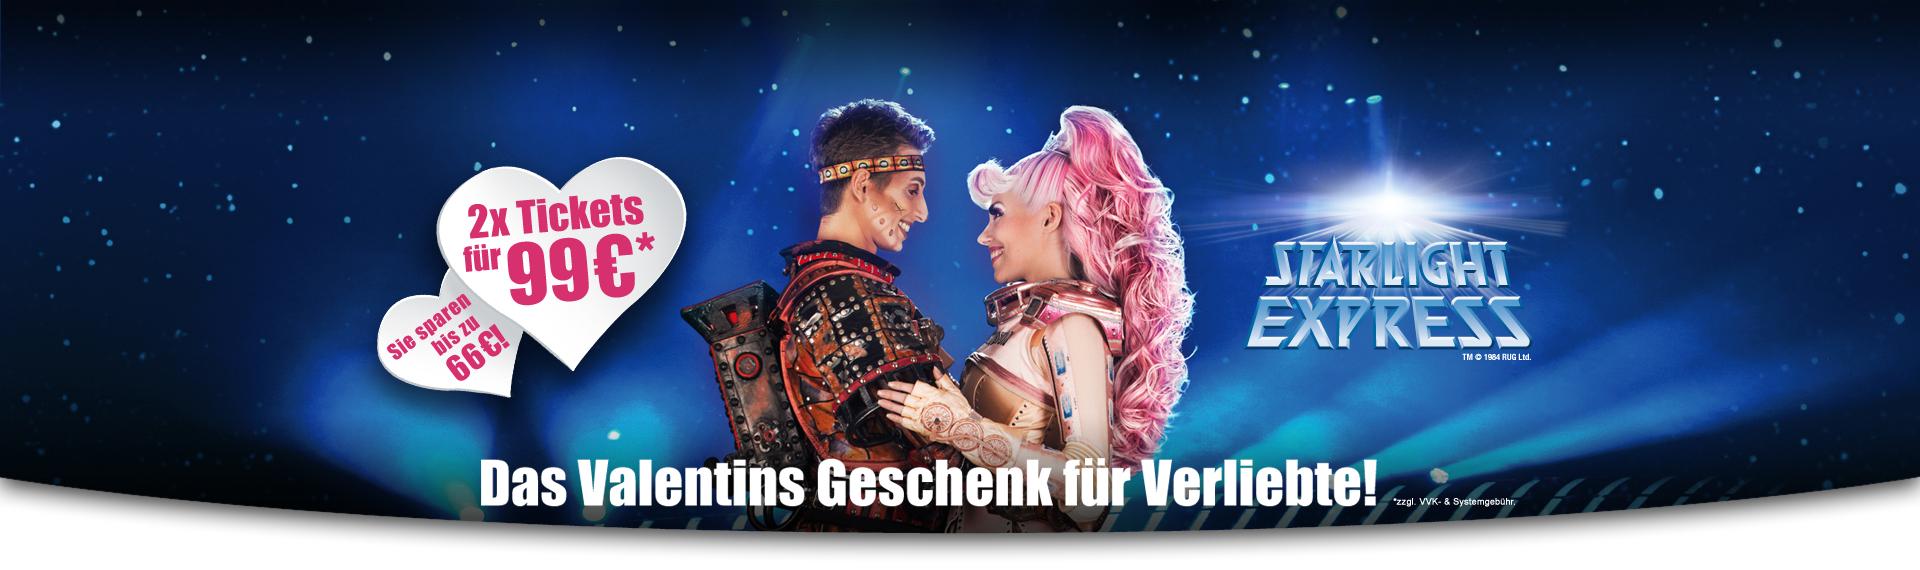 Starlight Express / Billy Elliot Musical Valentinsangebot 2x PK2 ab 99 € / 2x PK1 ab 122€ *zzgl Gebühren